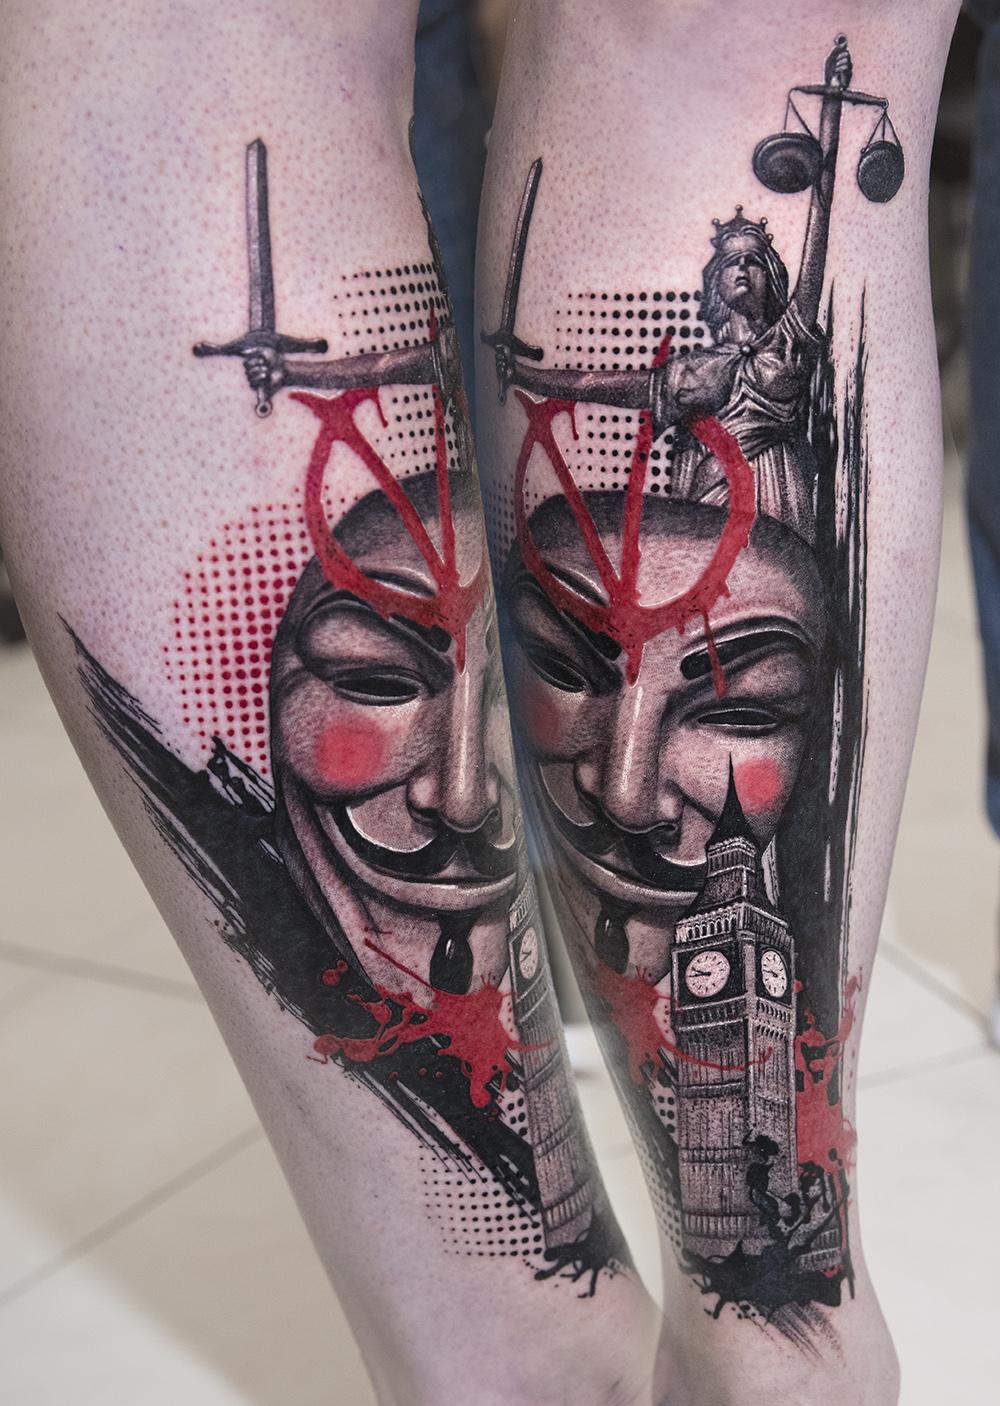 v for vendetta trash polka tattoo by Mikhail Andersson